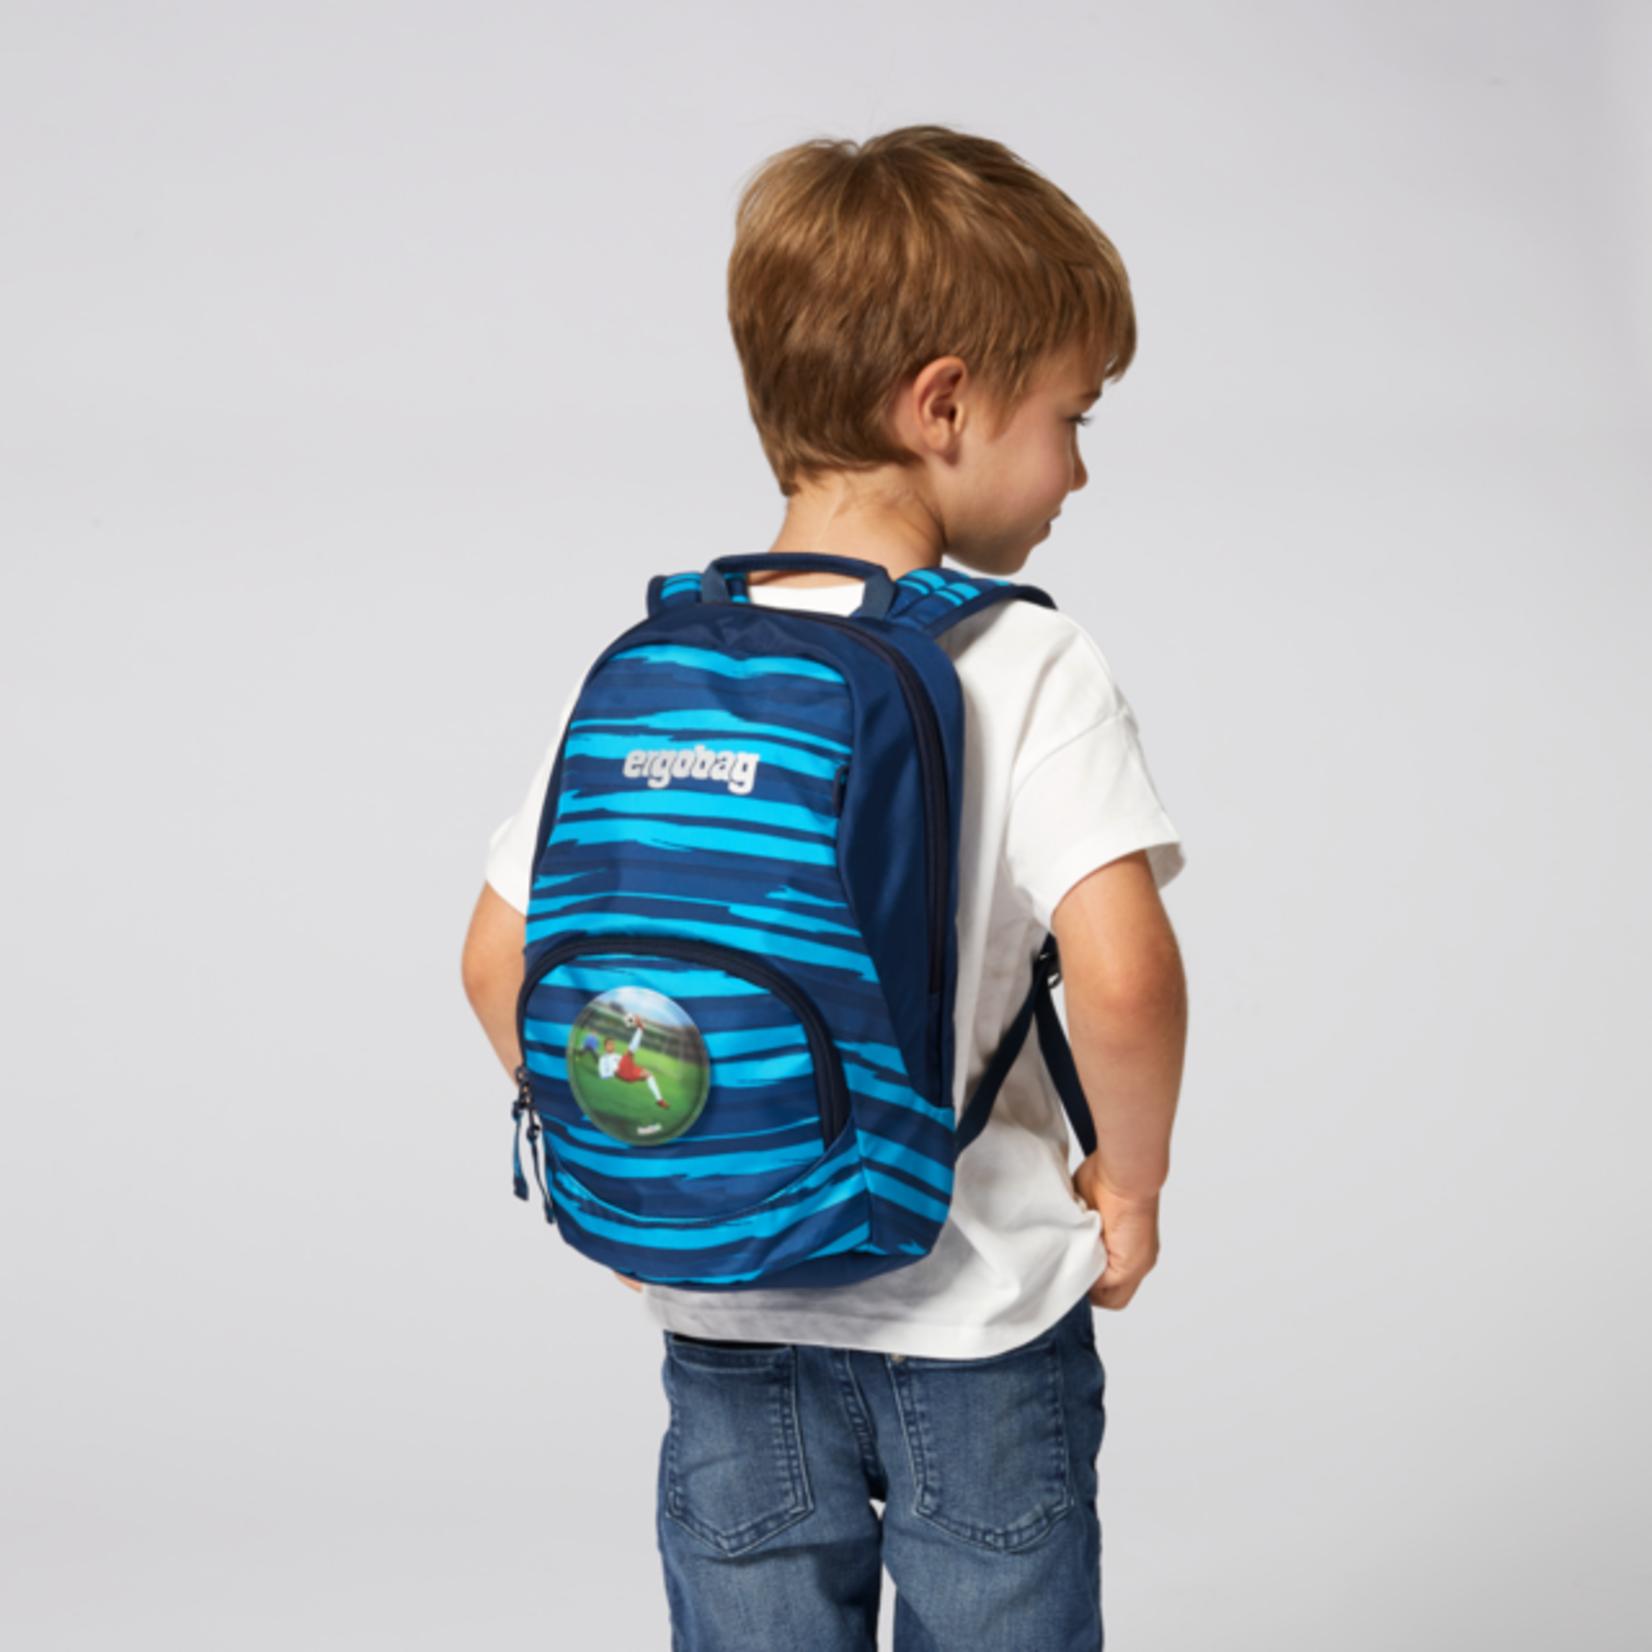 ERGOBAG ease small Kinderrucksack